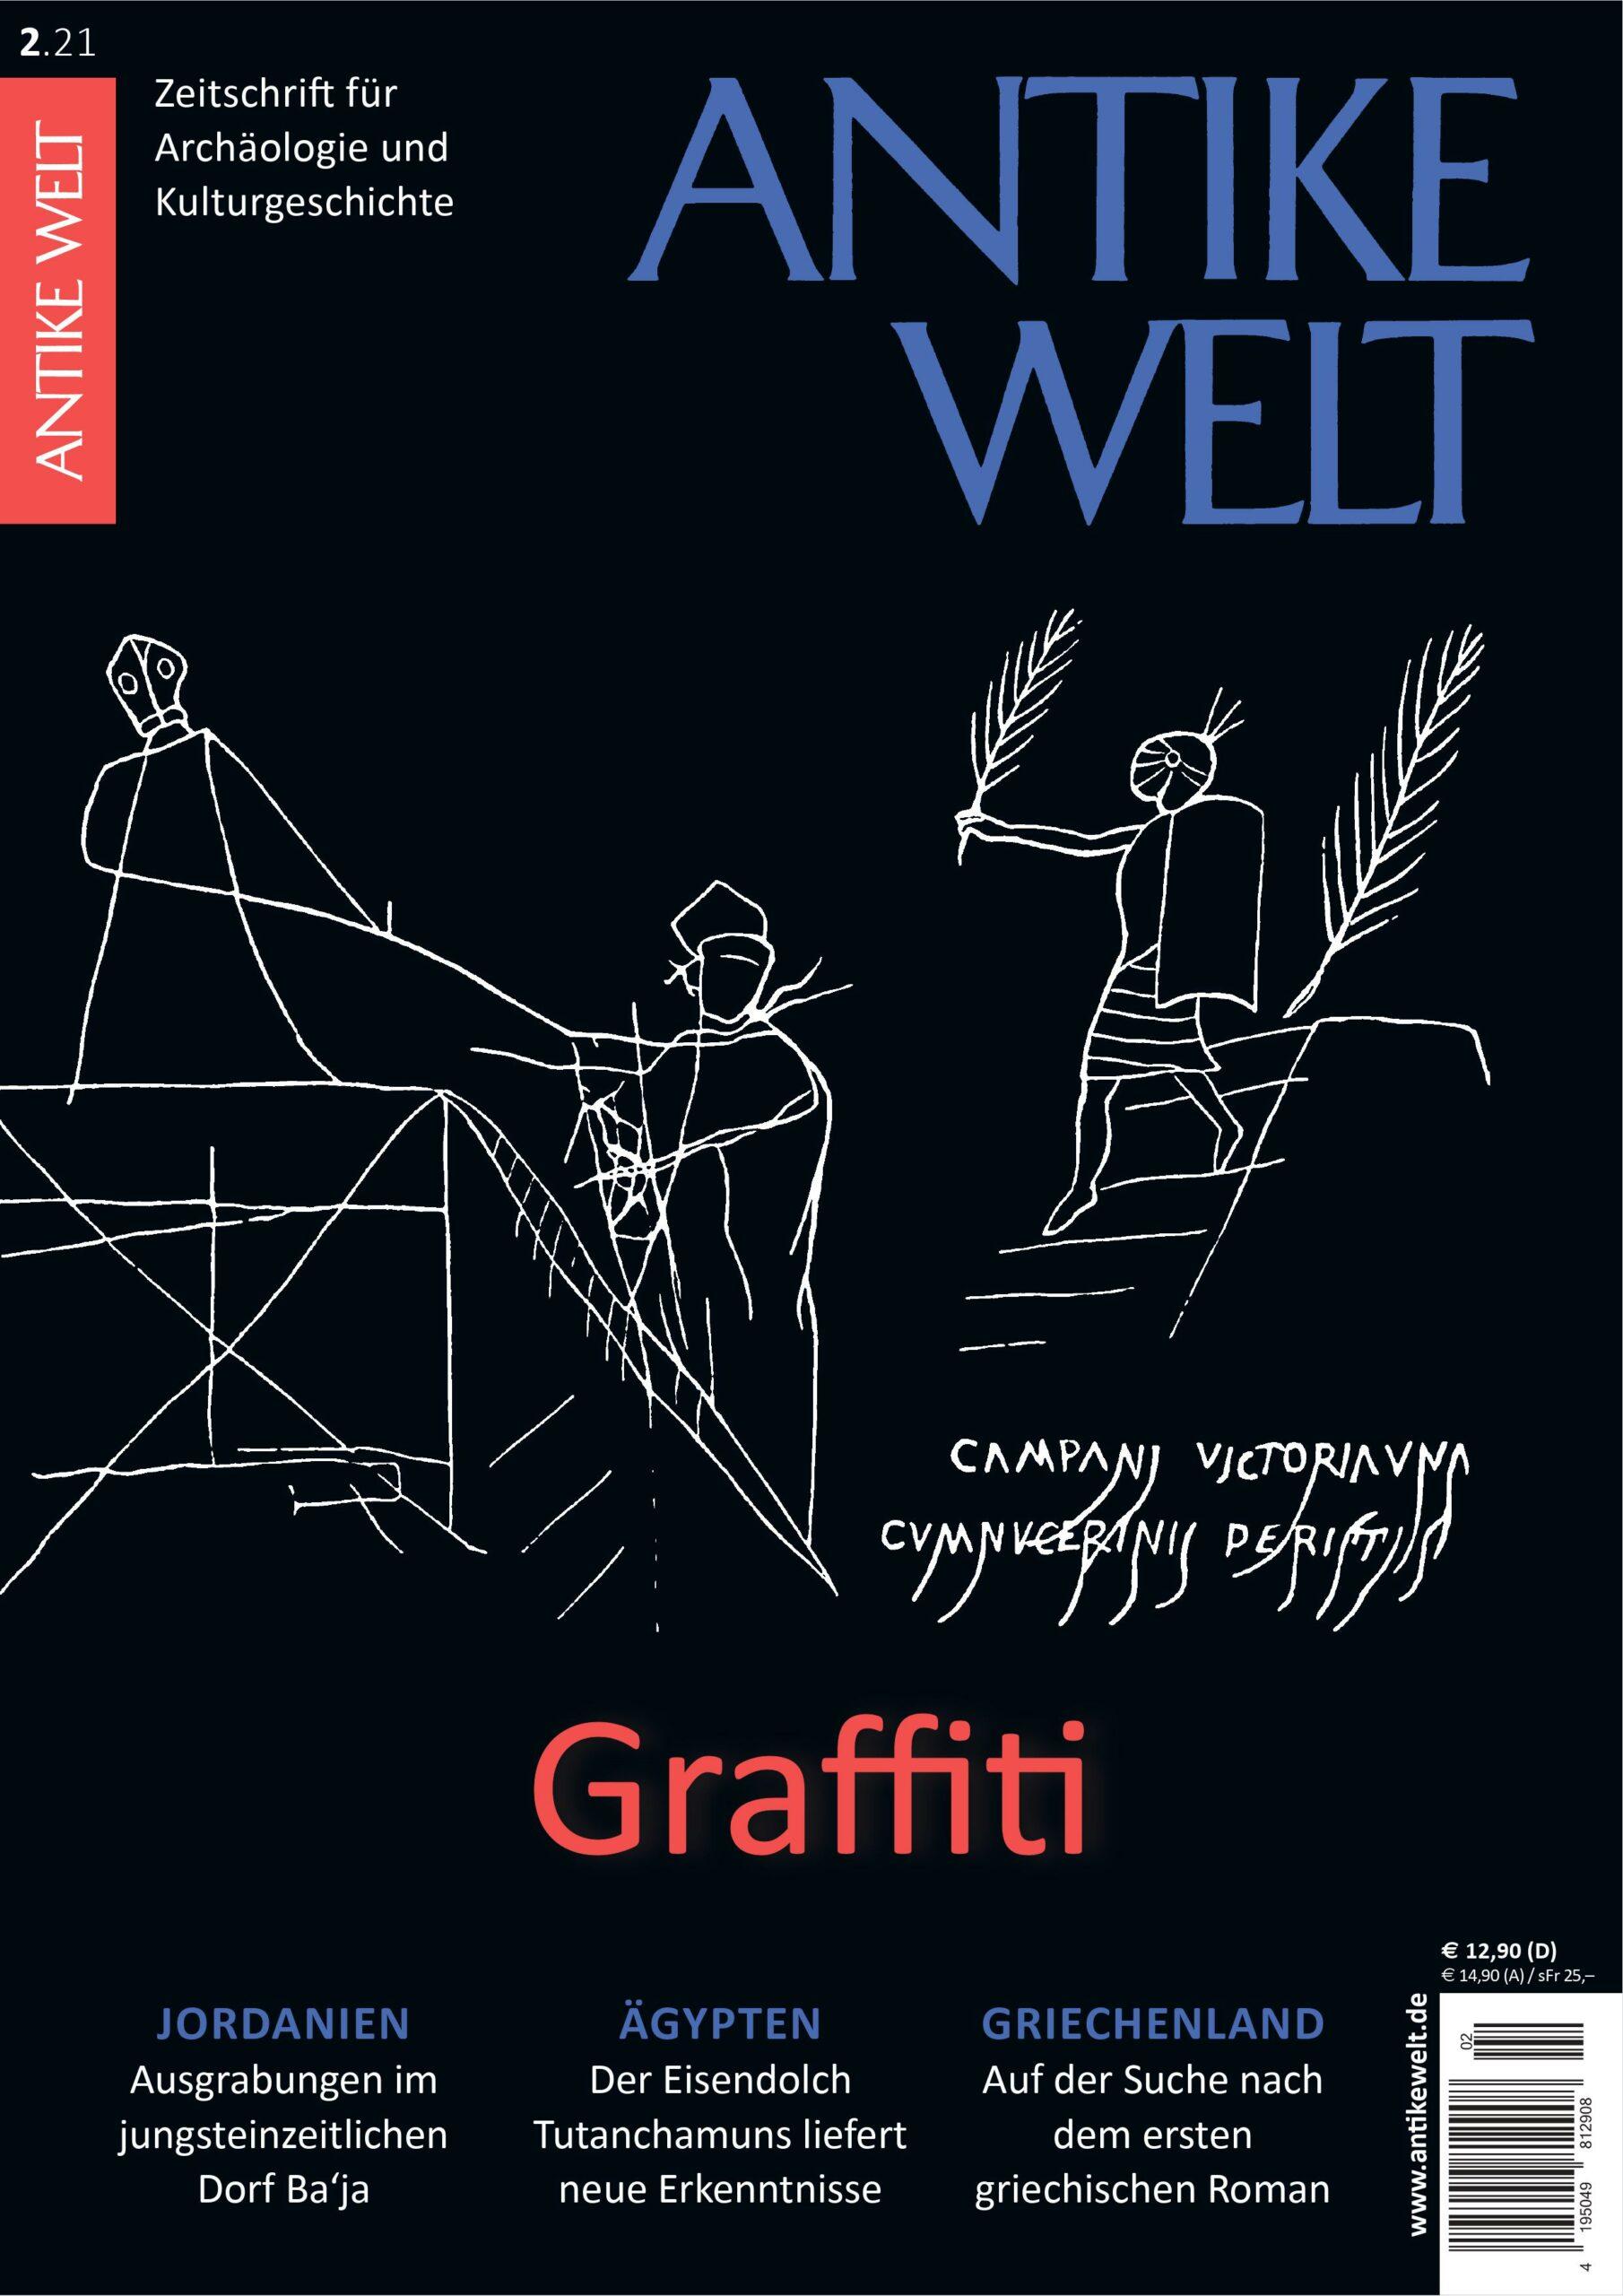 Graffiti – ANTIKE WELT 2/21